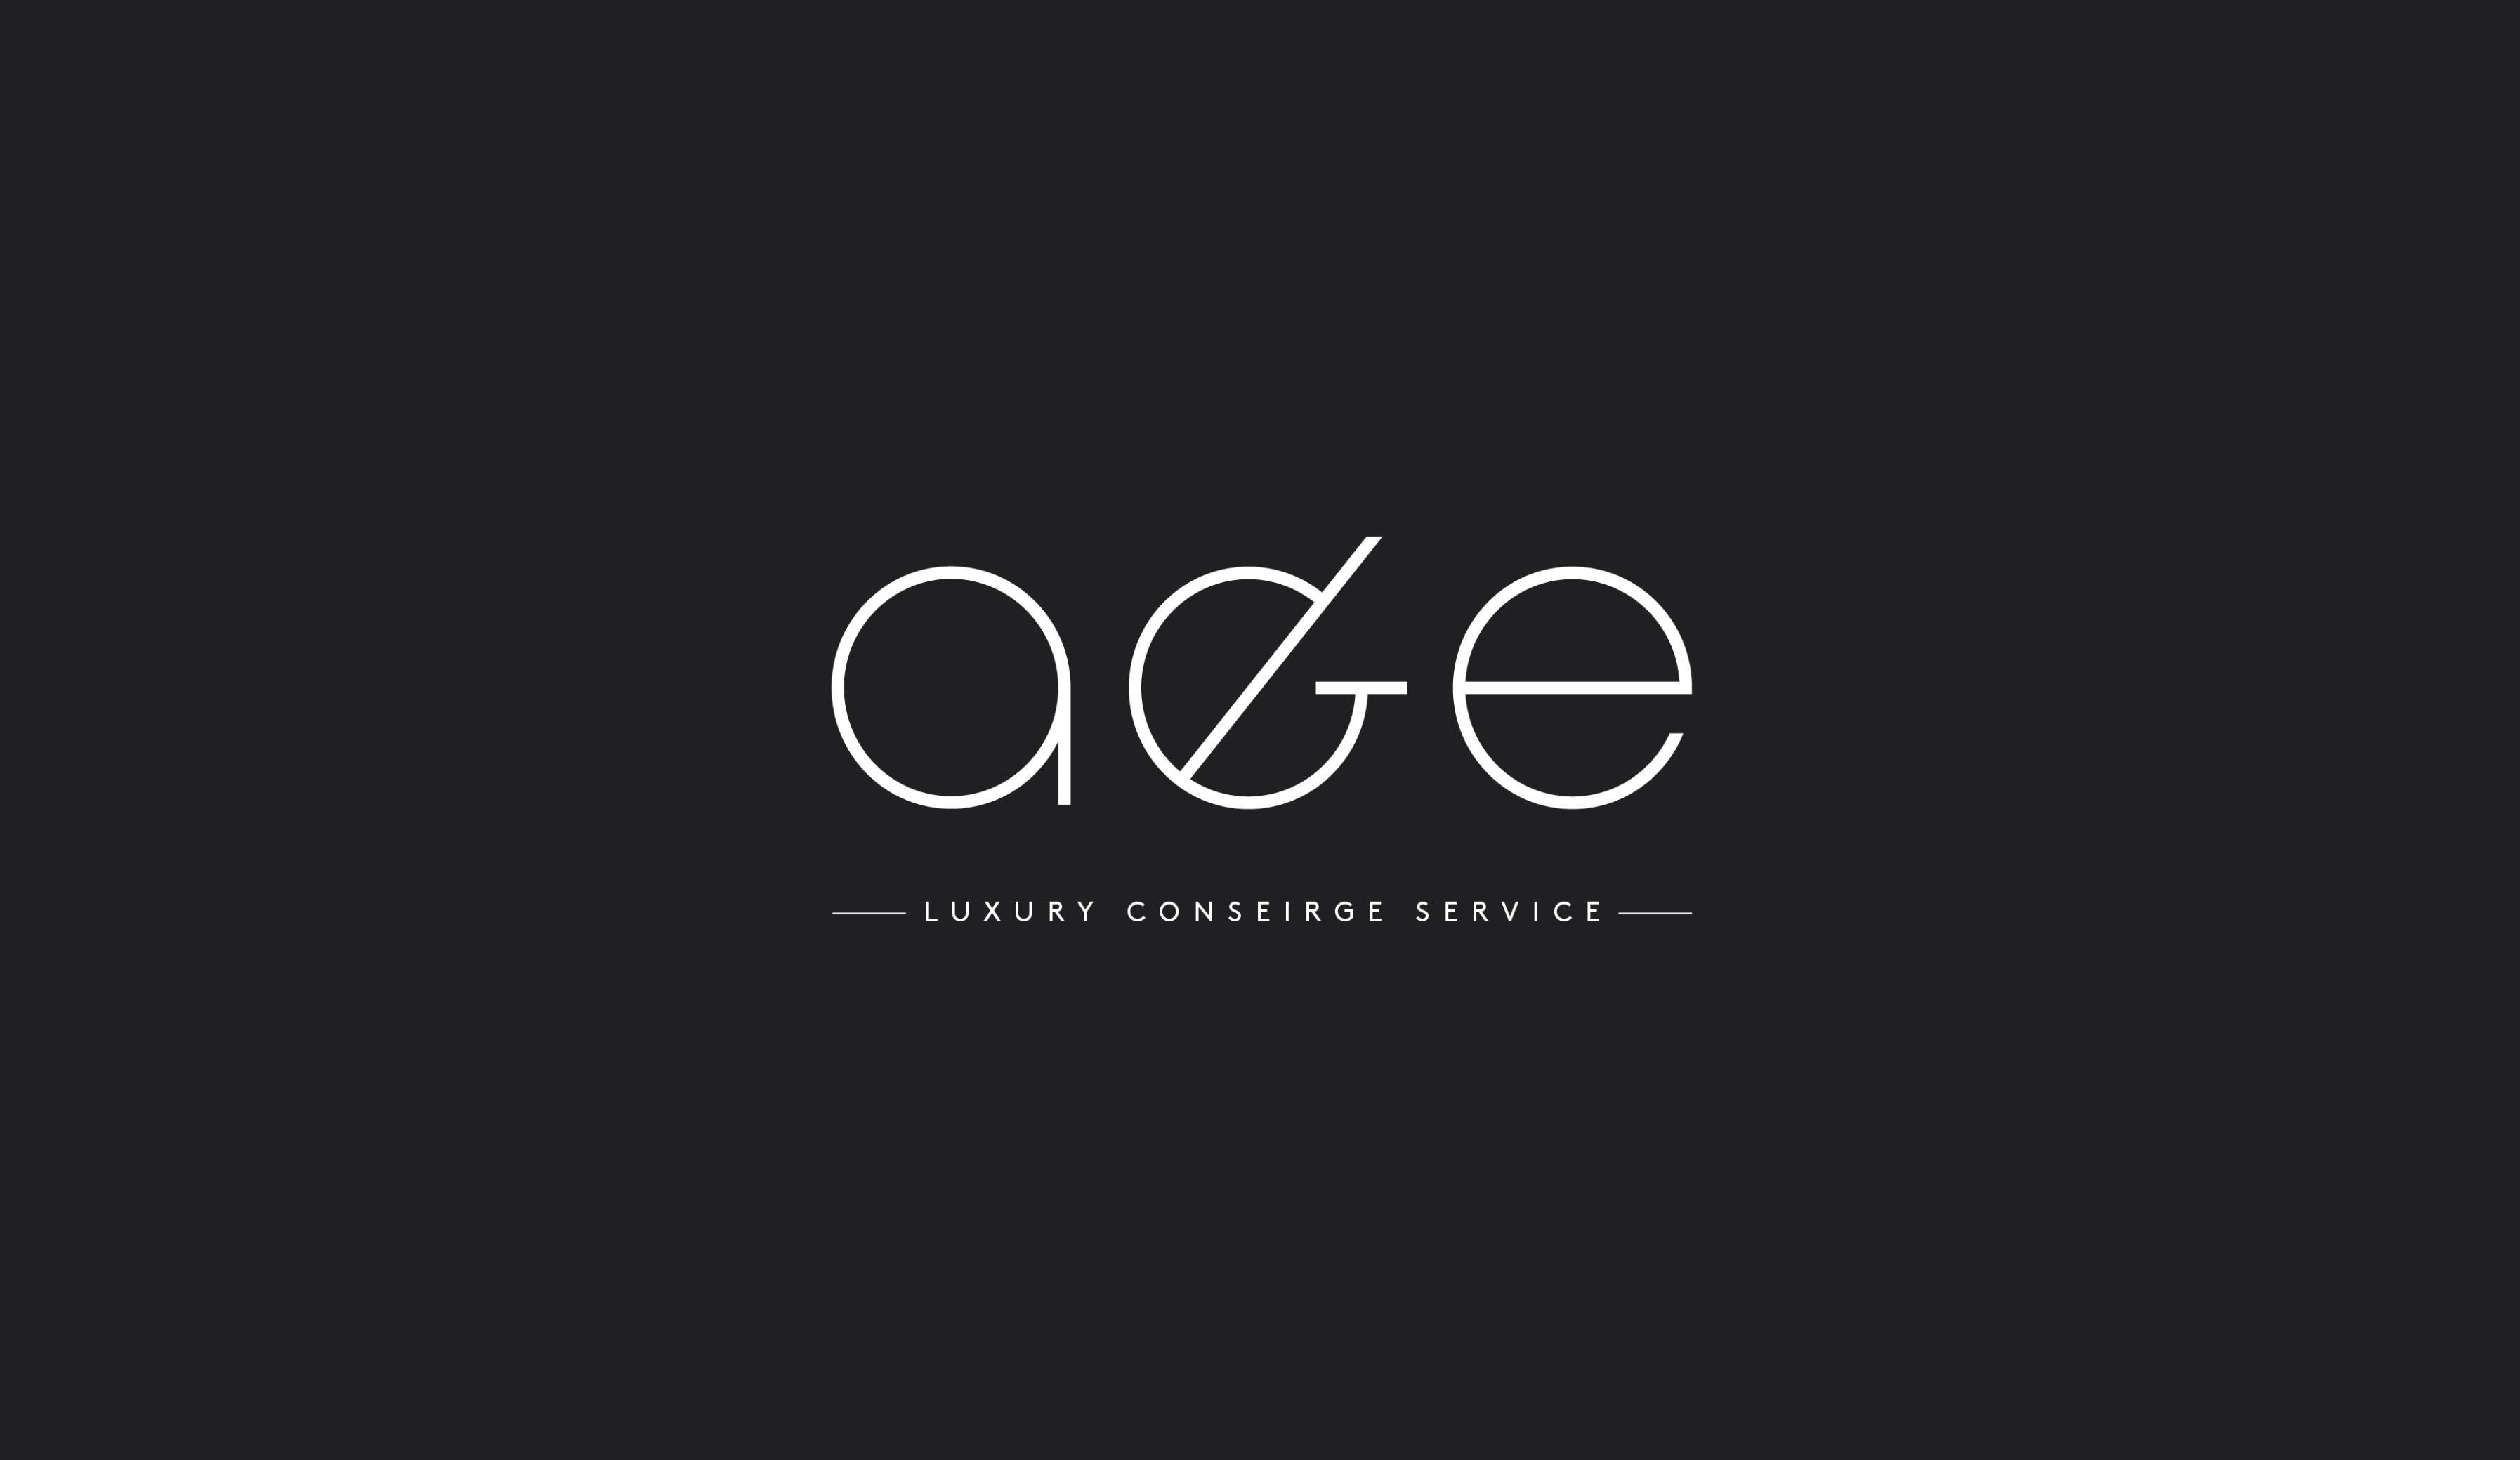 luxury conseirge service logo design